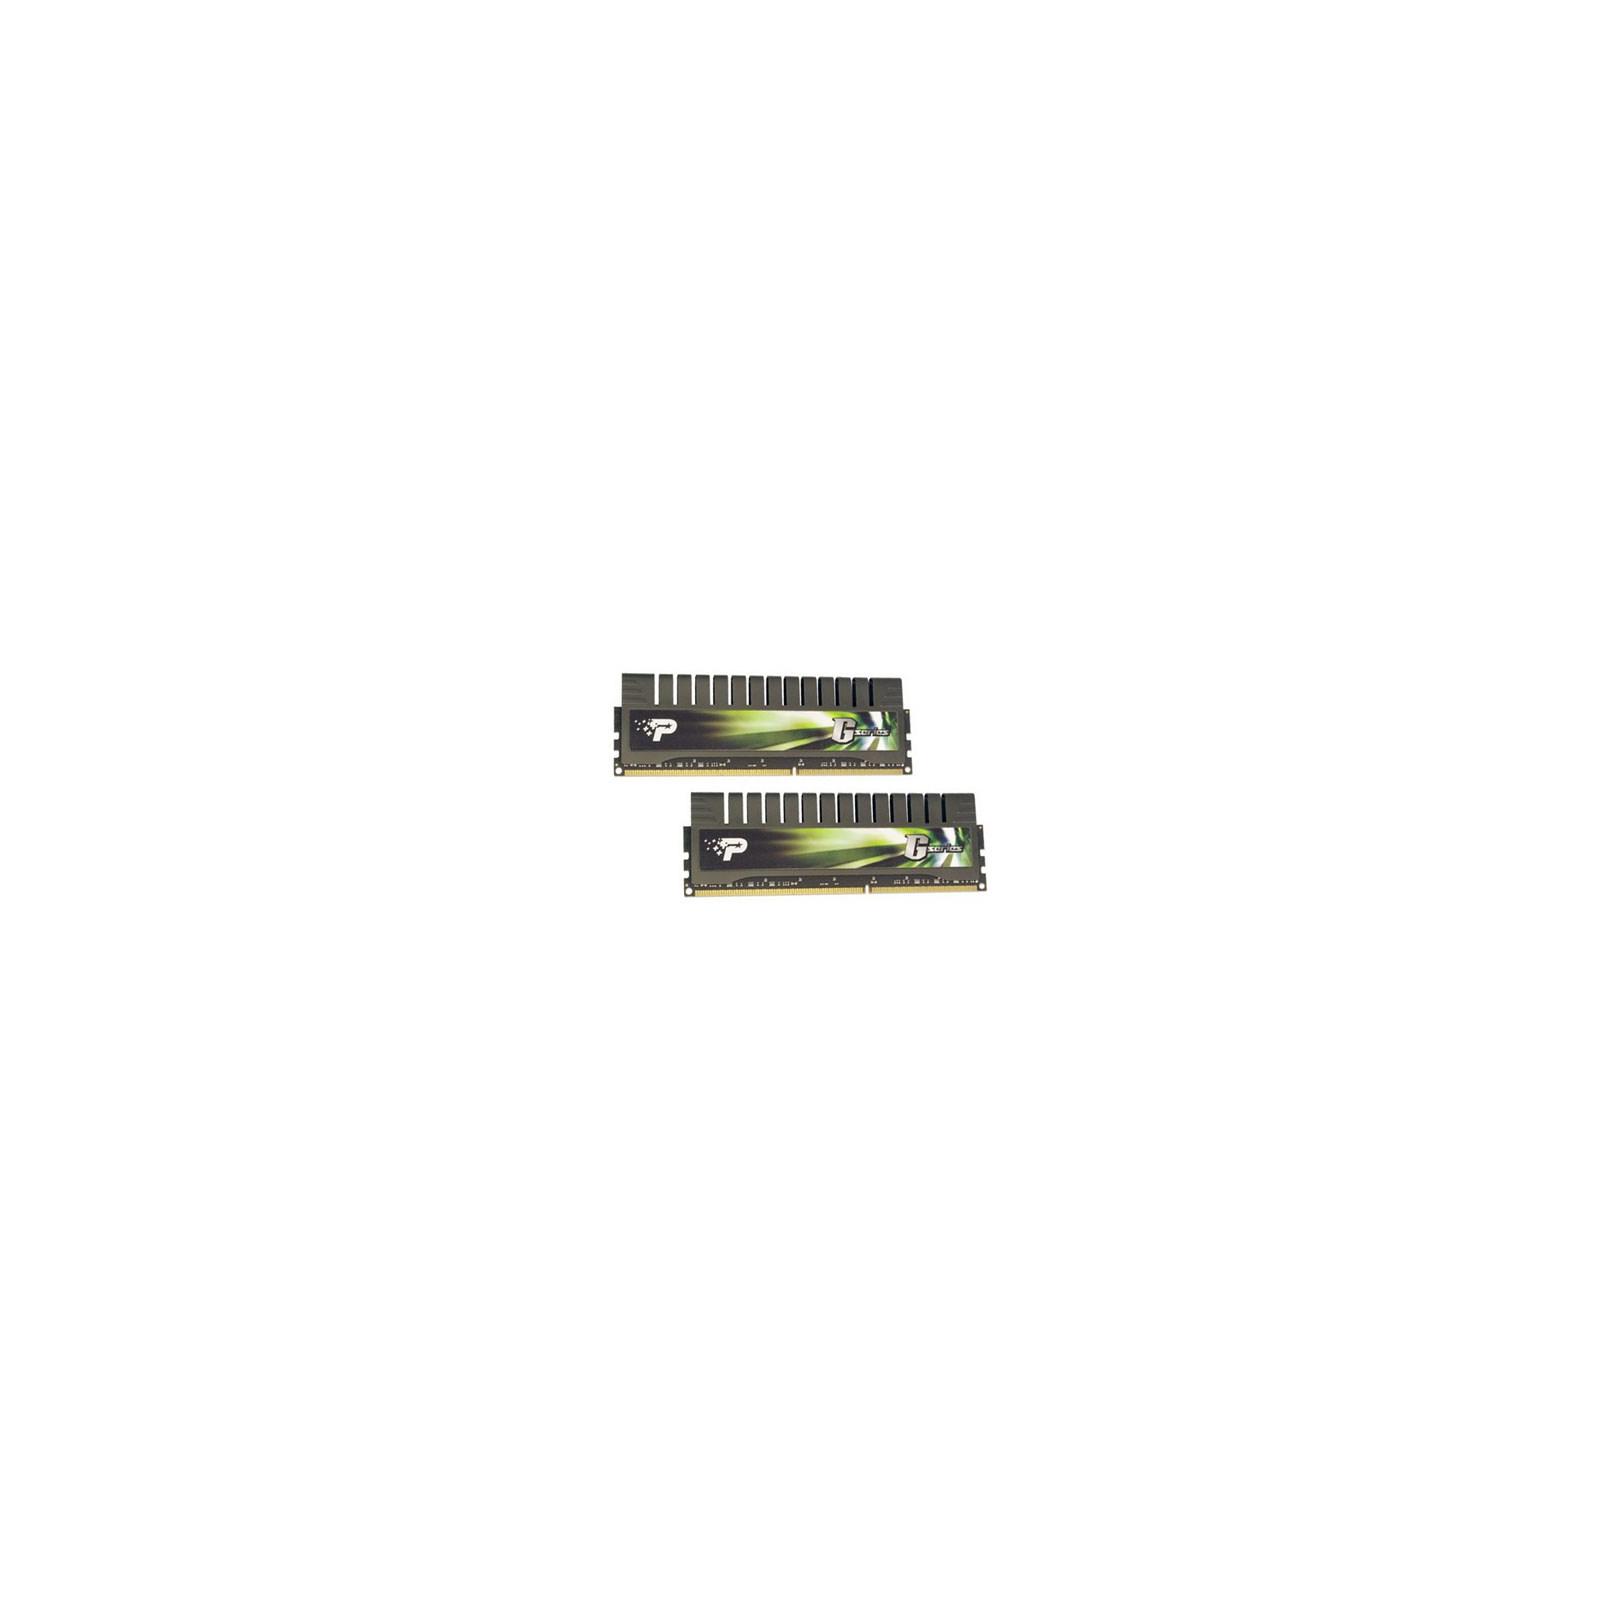 Модуль памяти для компьютера DDR3 8GB (2x4GB) 1600 MHz Patriot (PGV38G1600ELK)